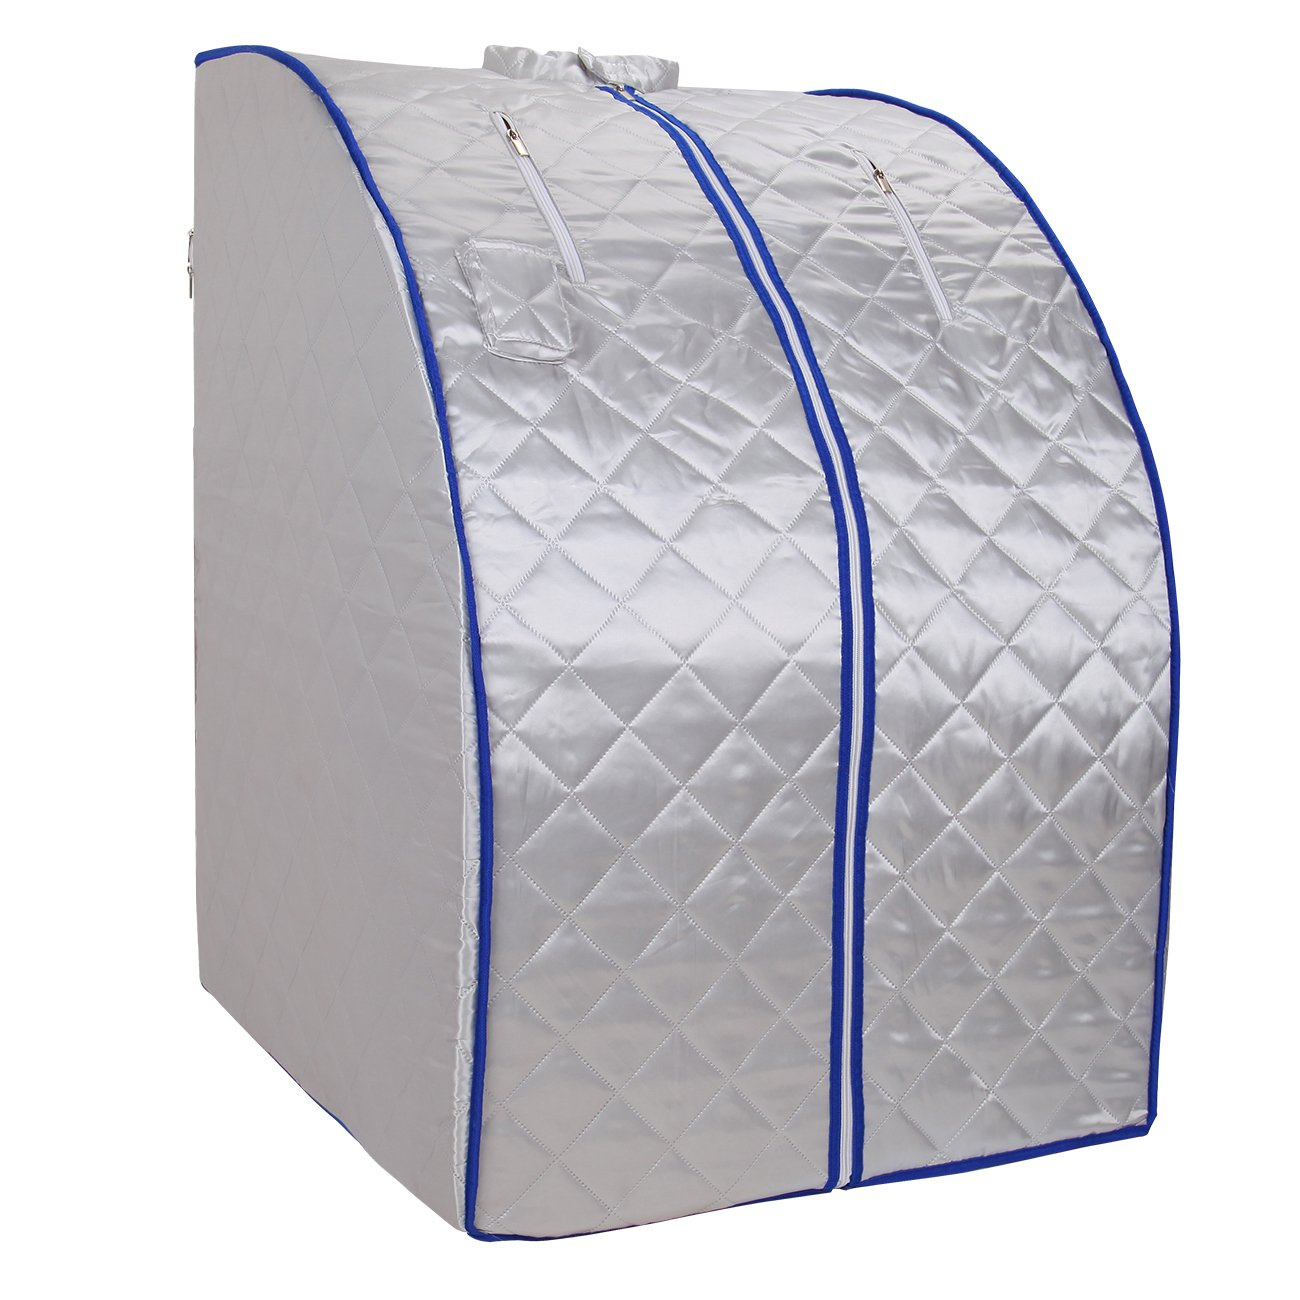 Ridgeyard Portable Safe Folding Far FIR Infrared Sauna Spa Tent with Heating Footpad and Chair Slimming Weight Loss +Negative Ion Detox Ridgeyard co .ltd